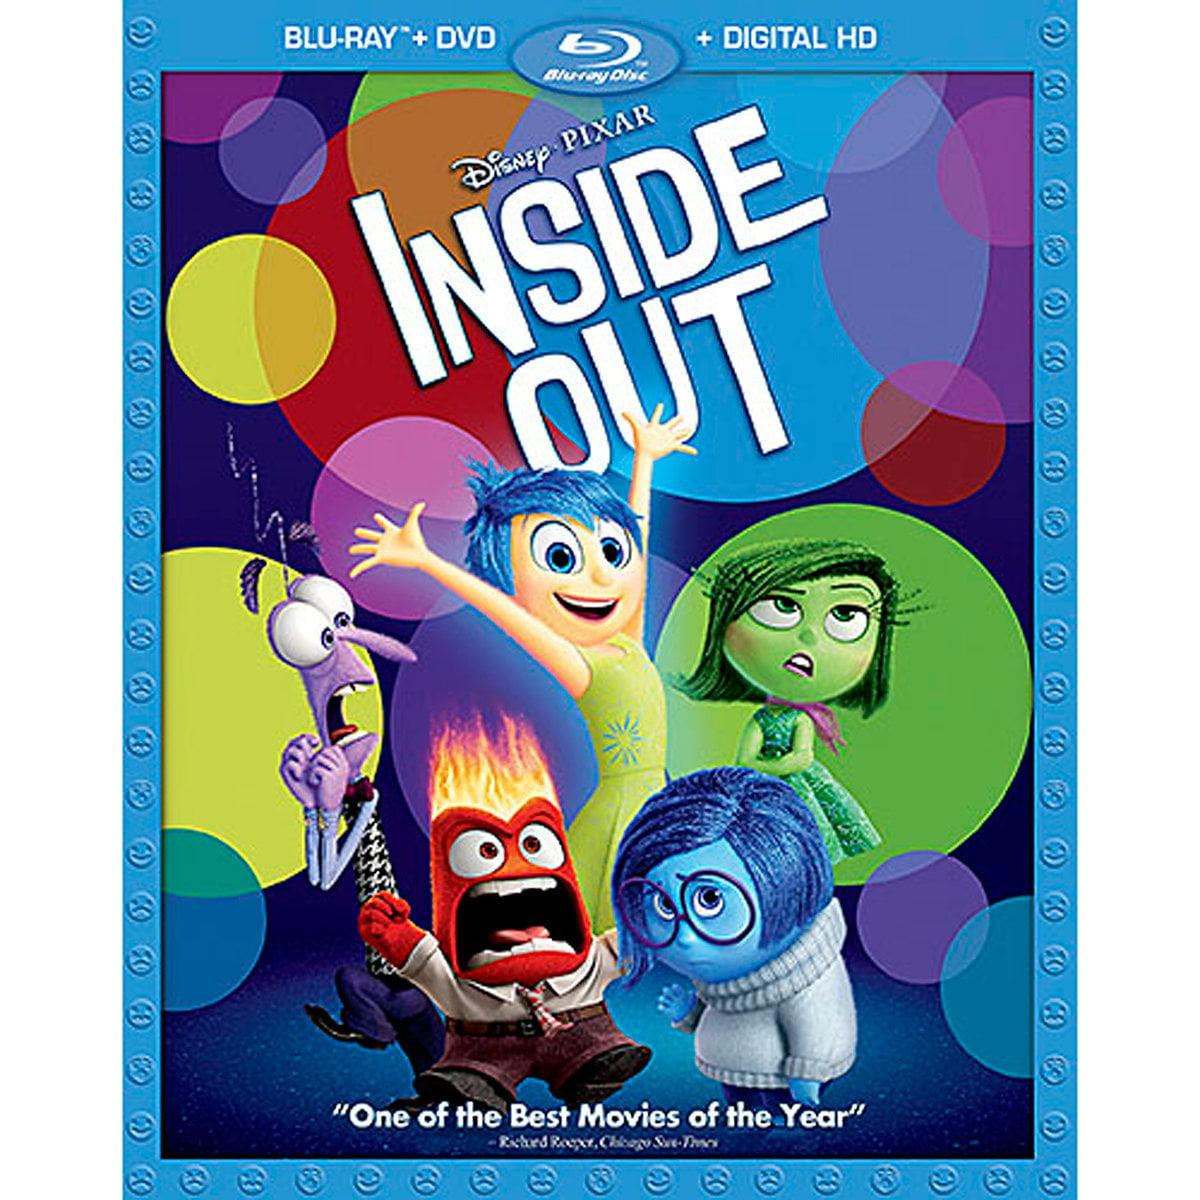 Inside Out (Blu-ray + DVD + Digital HD)